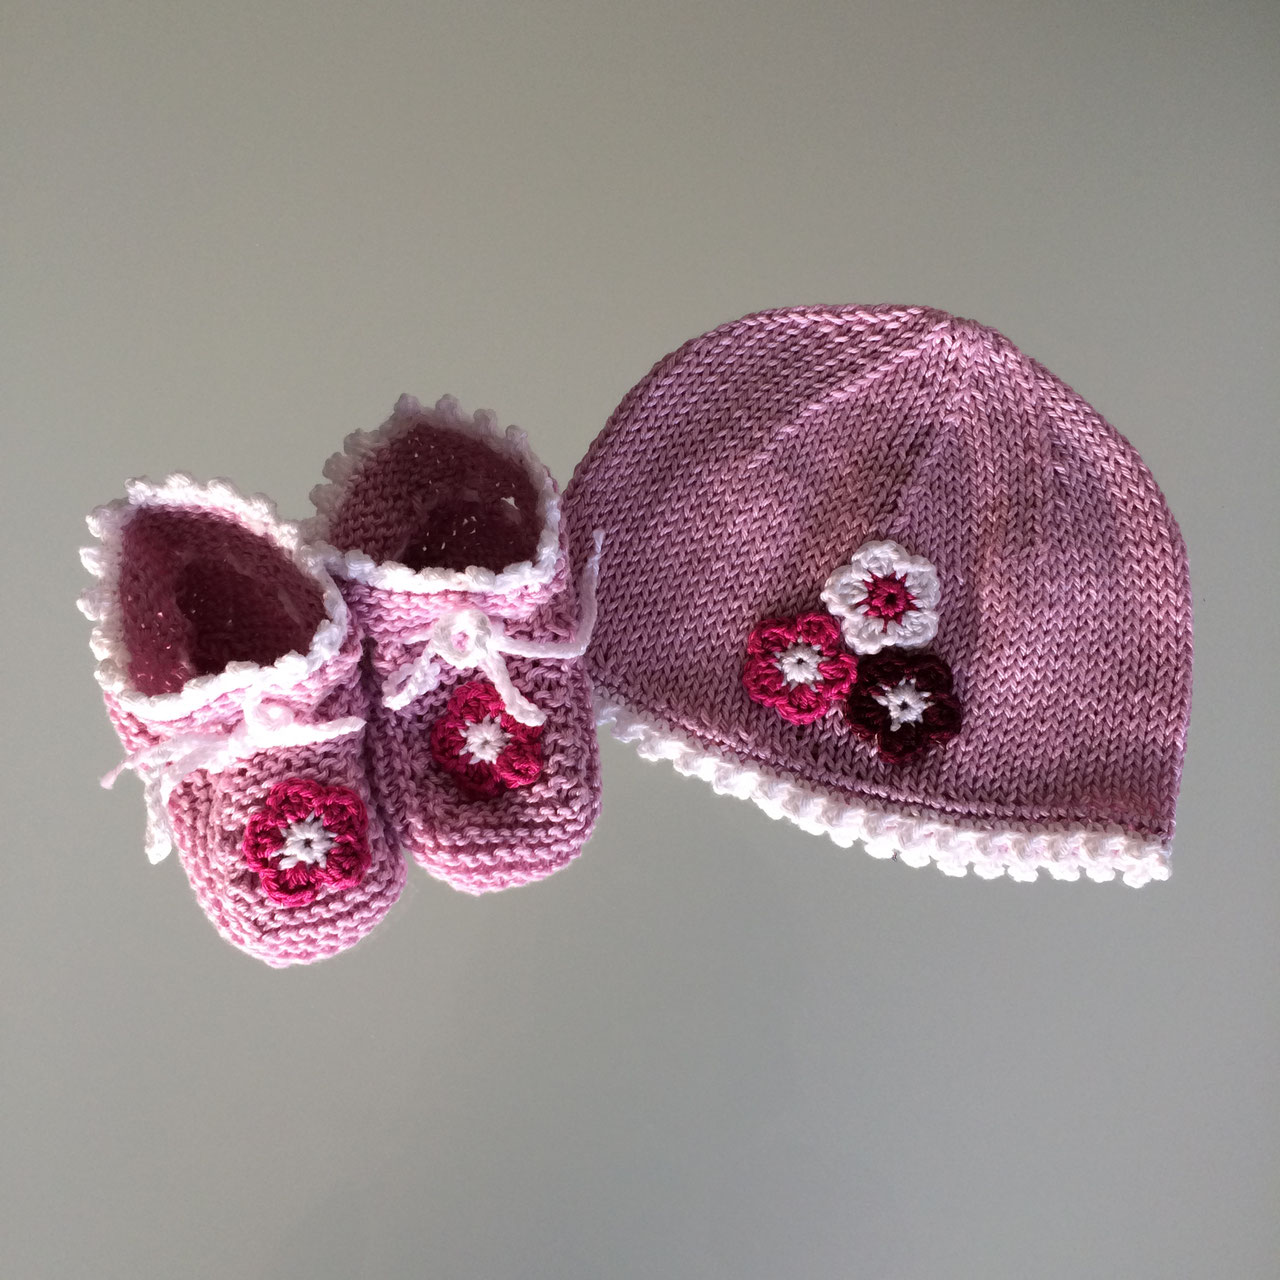 Babyset Kinderset Mütze Schuhe Erdbeer-Look Geburtsgeschenk Wunschgrößen